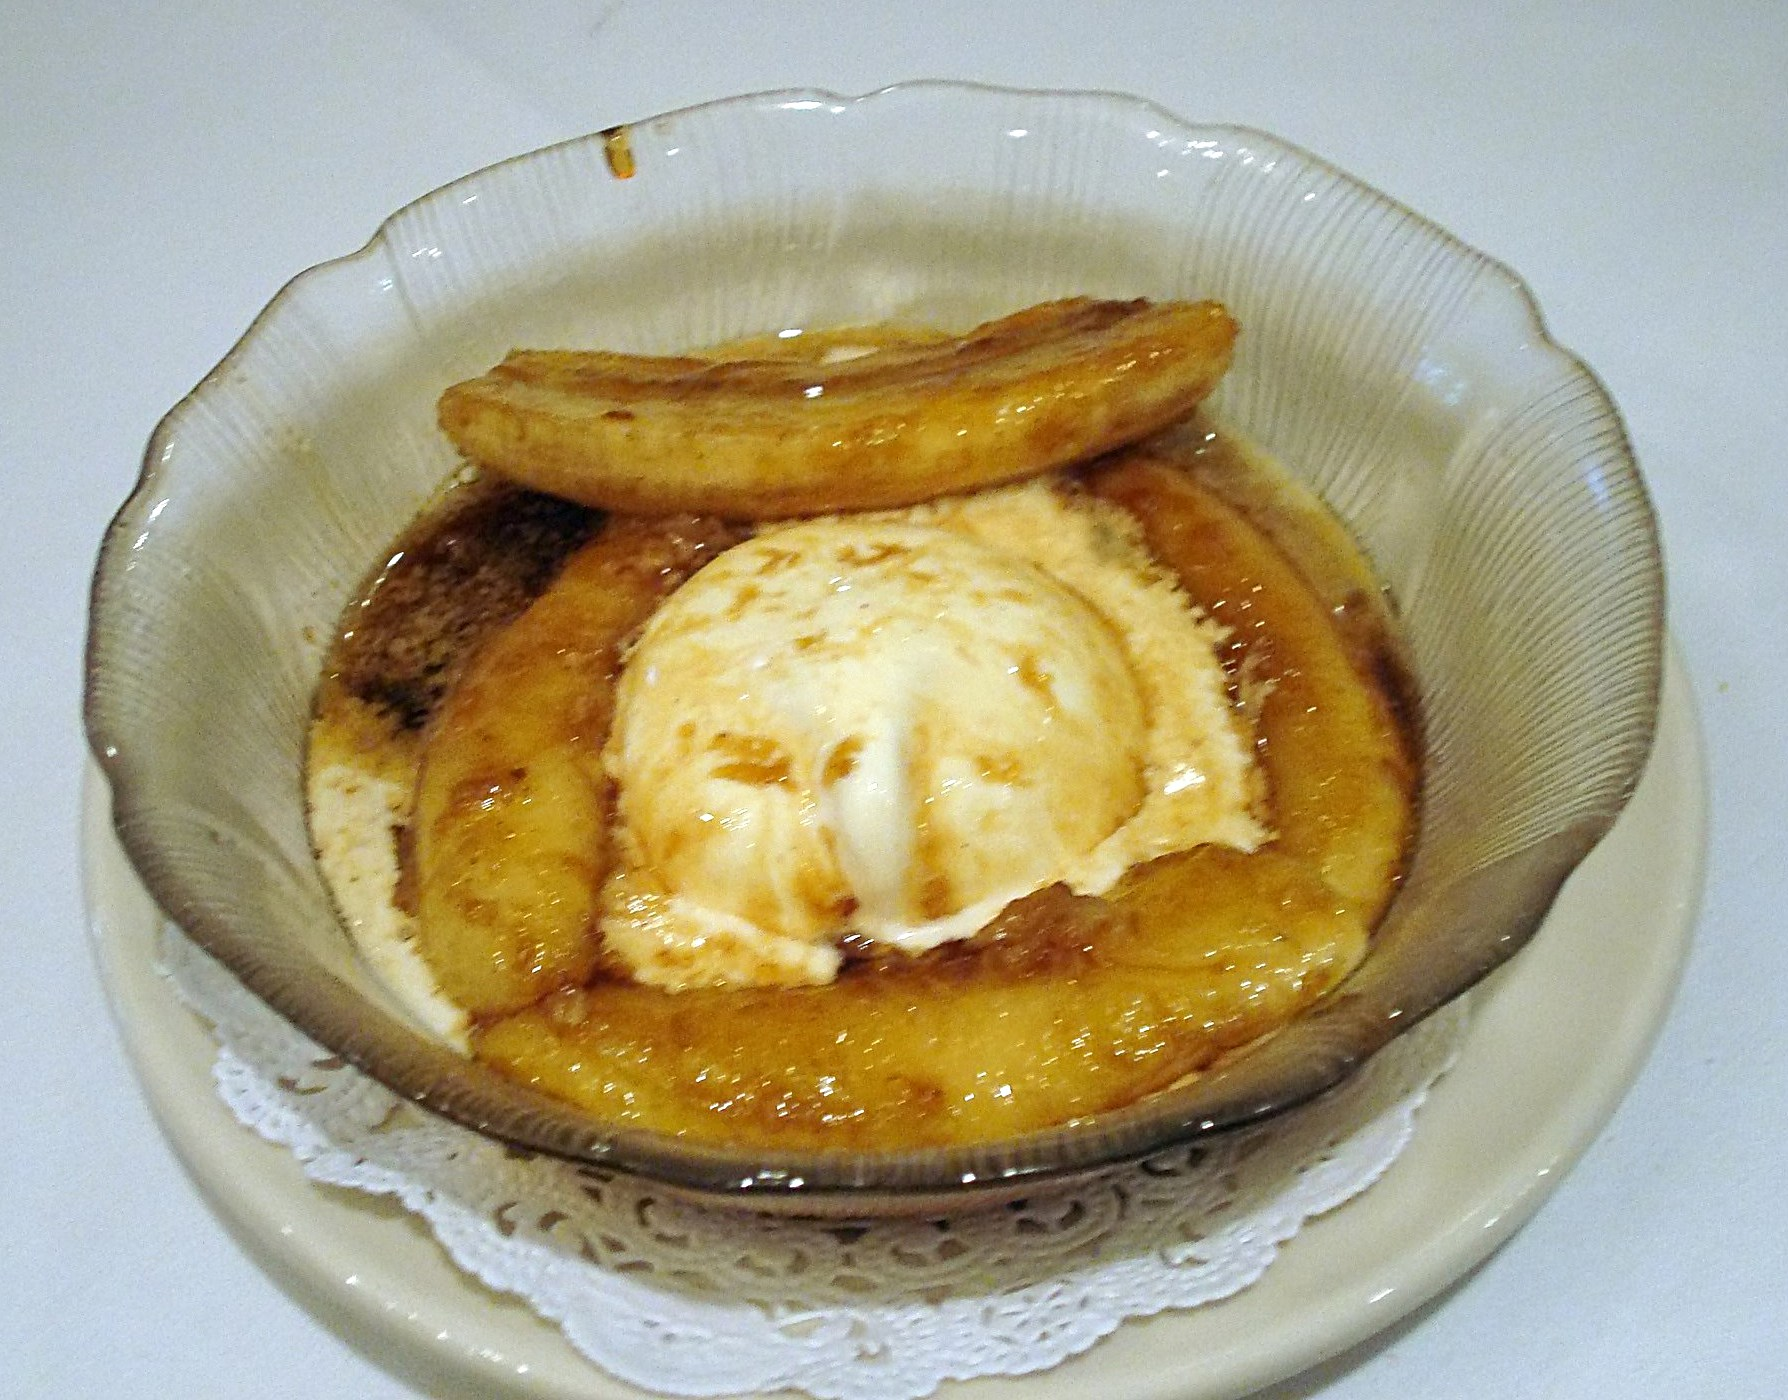 File:Brennan's Bananas Foster.jpg - Wikipedia, the free encyclopedia